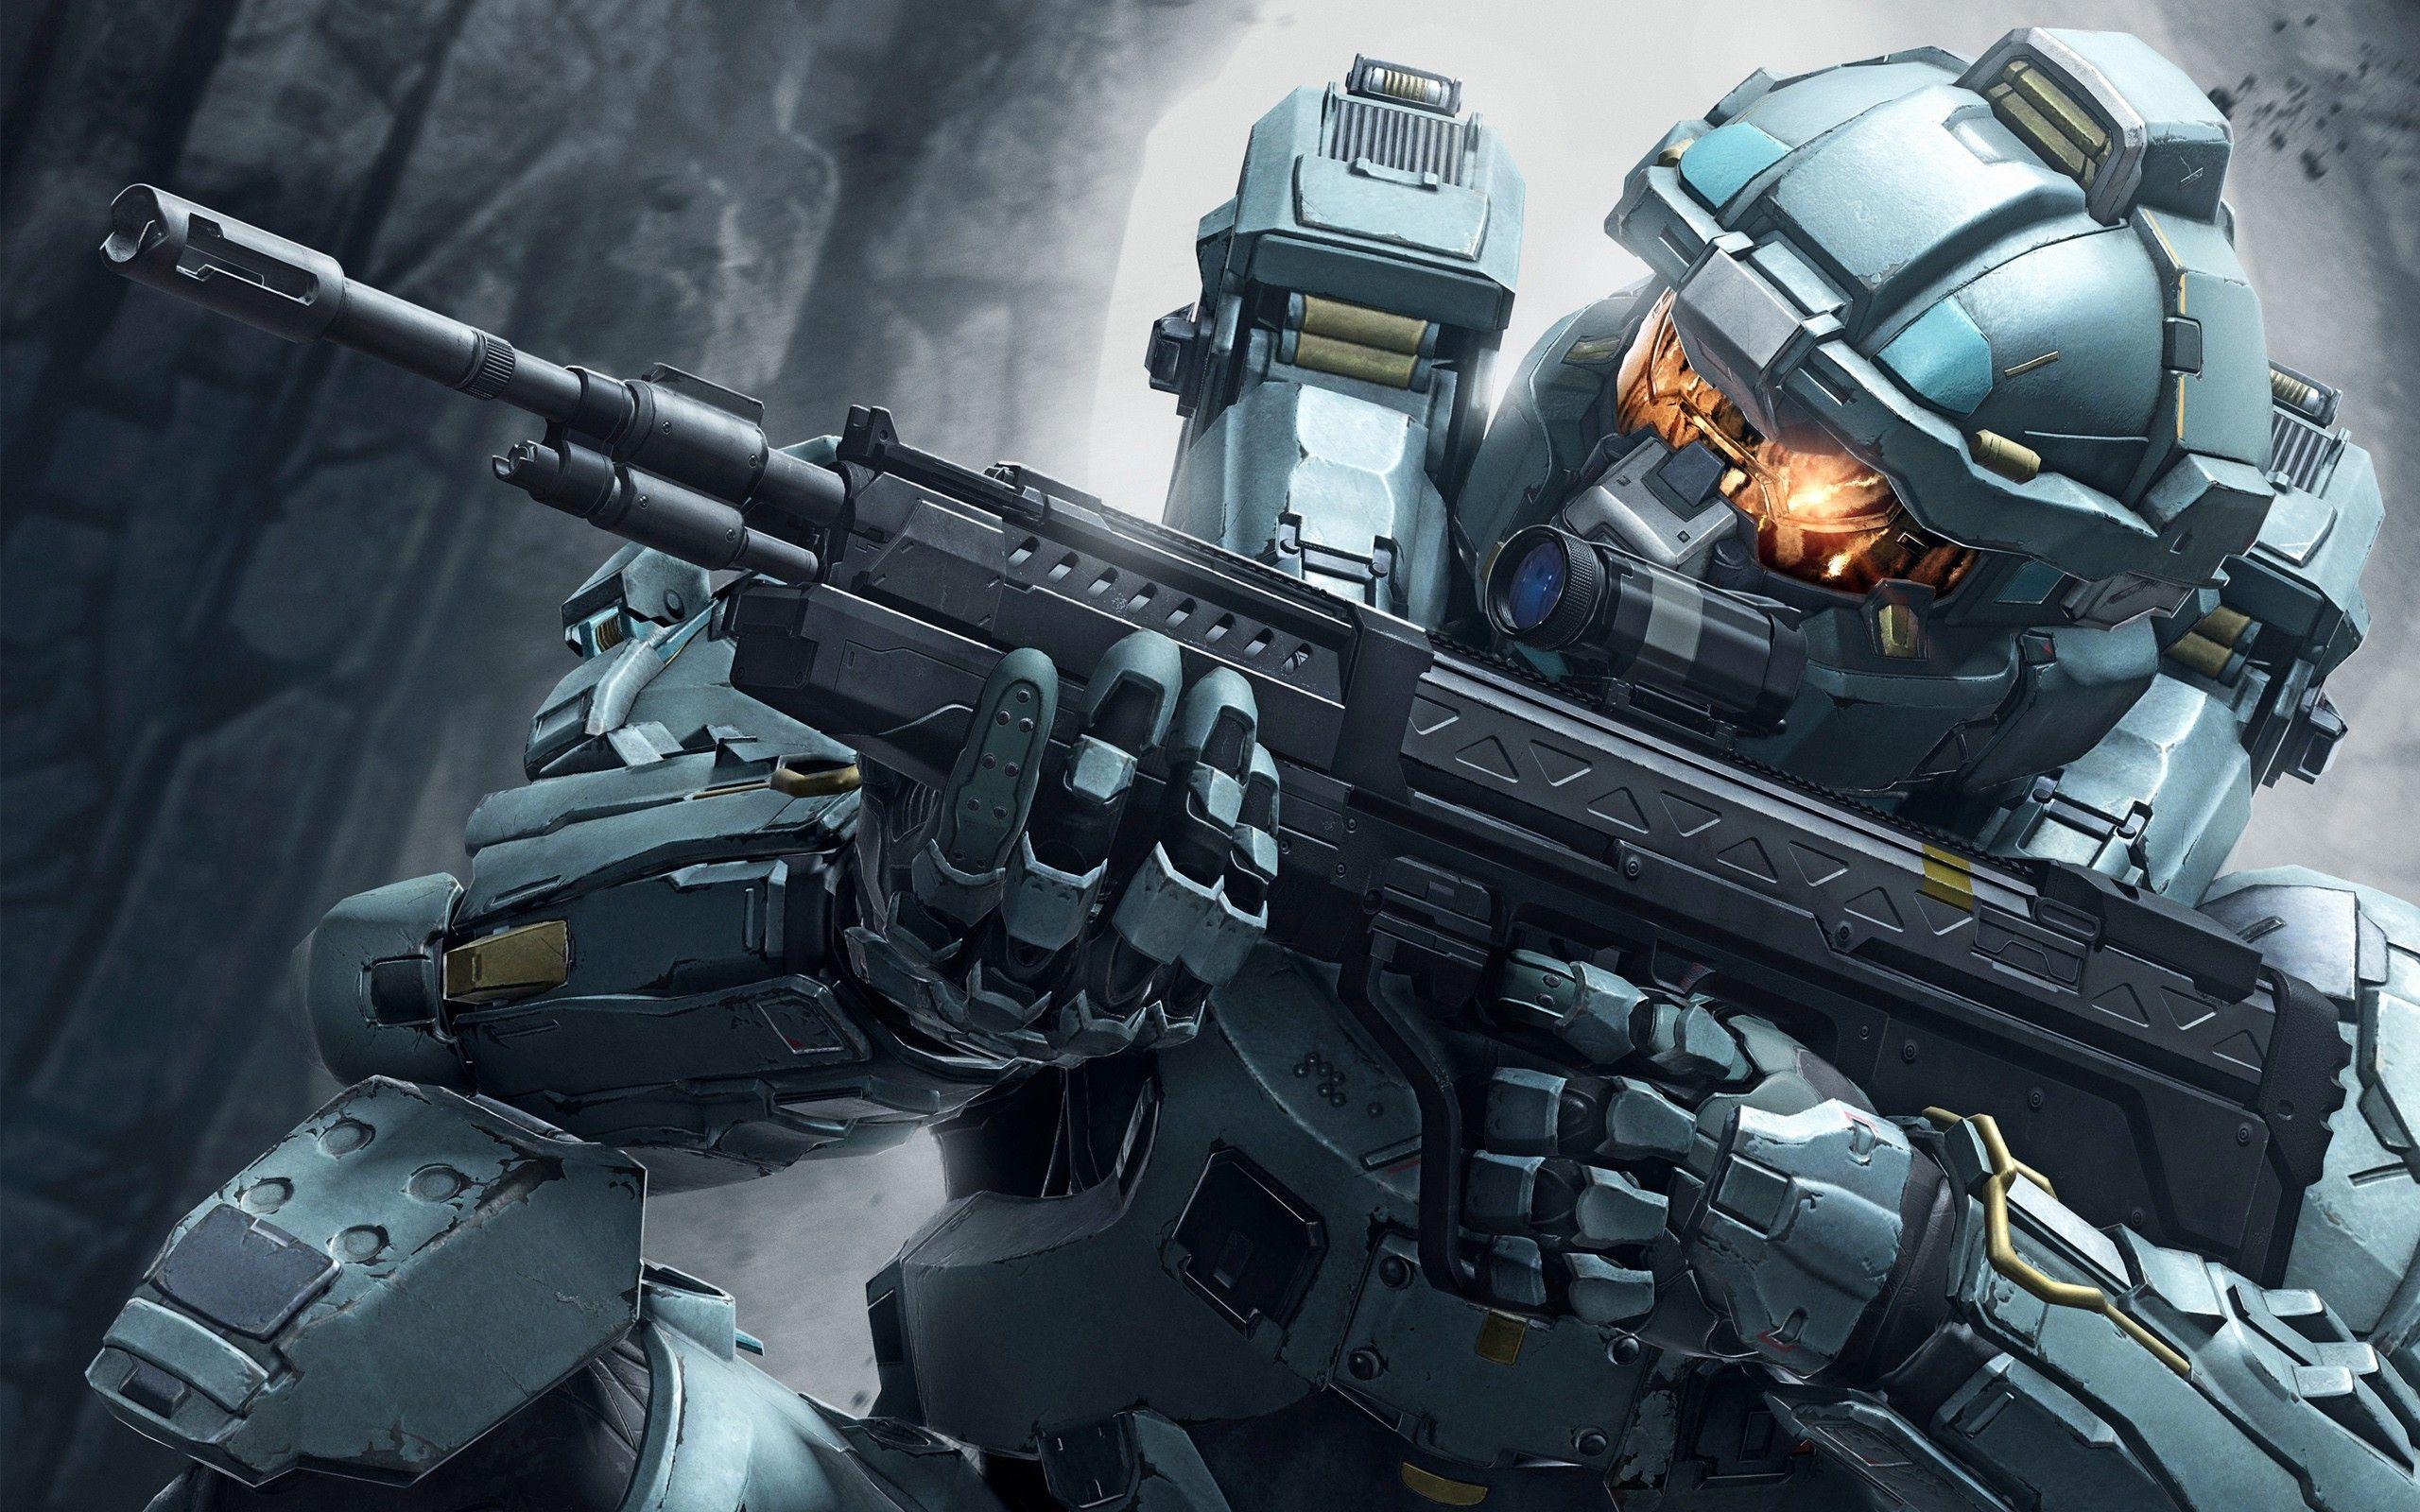 Spartan Fredrick 104 Halo 5 Halo 5 Guardians Halo Guardians